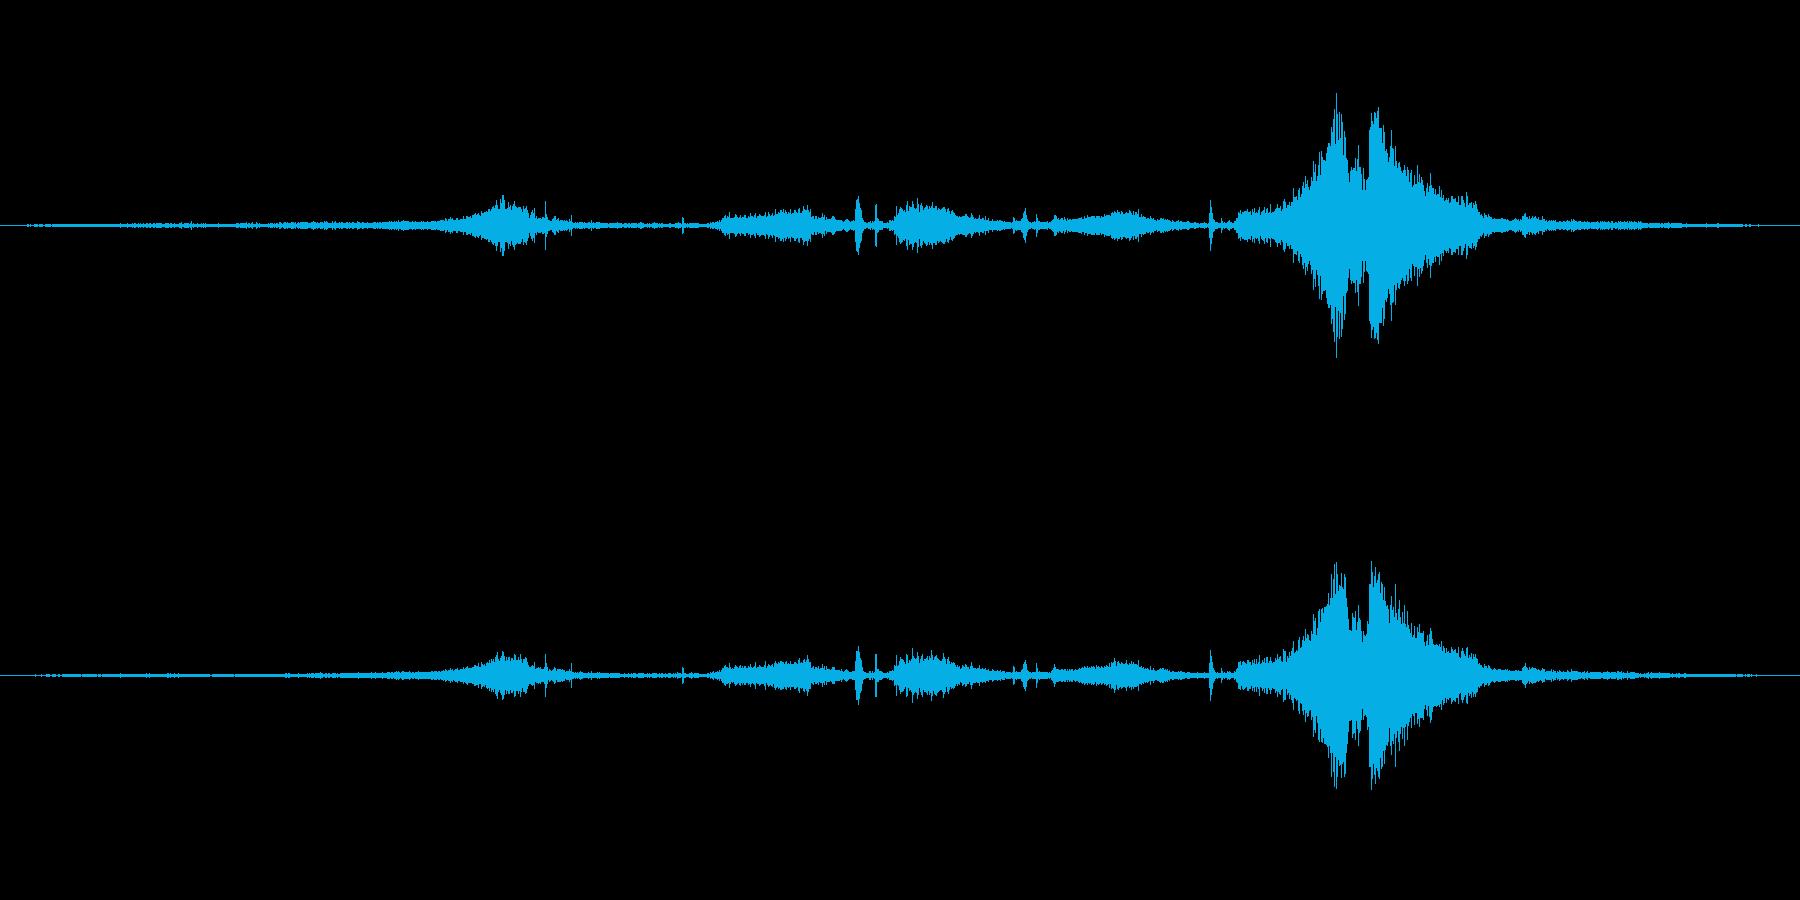 EXT:プルアップアンドバイ、スト...の再生済みの波形